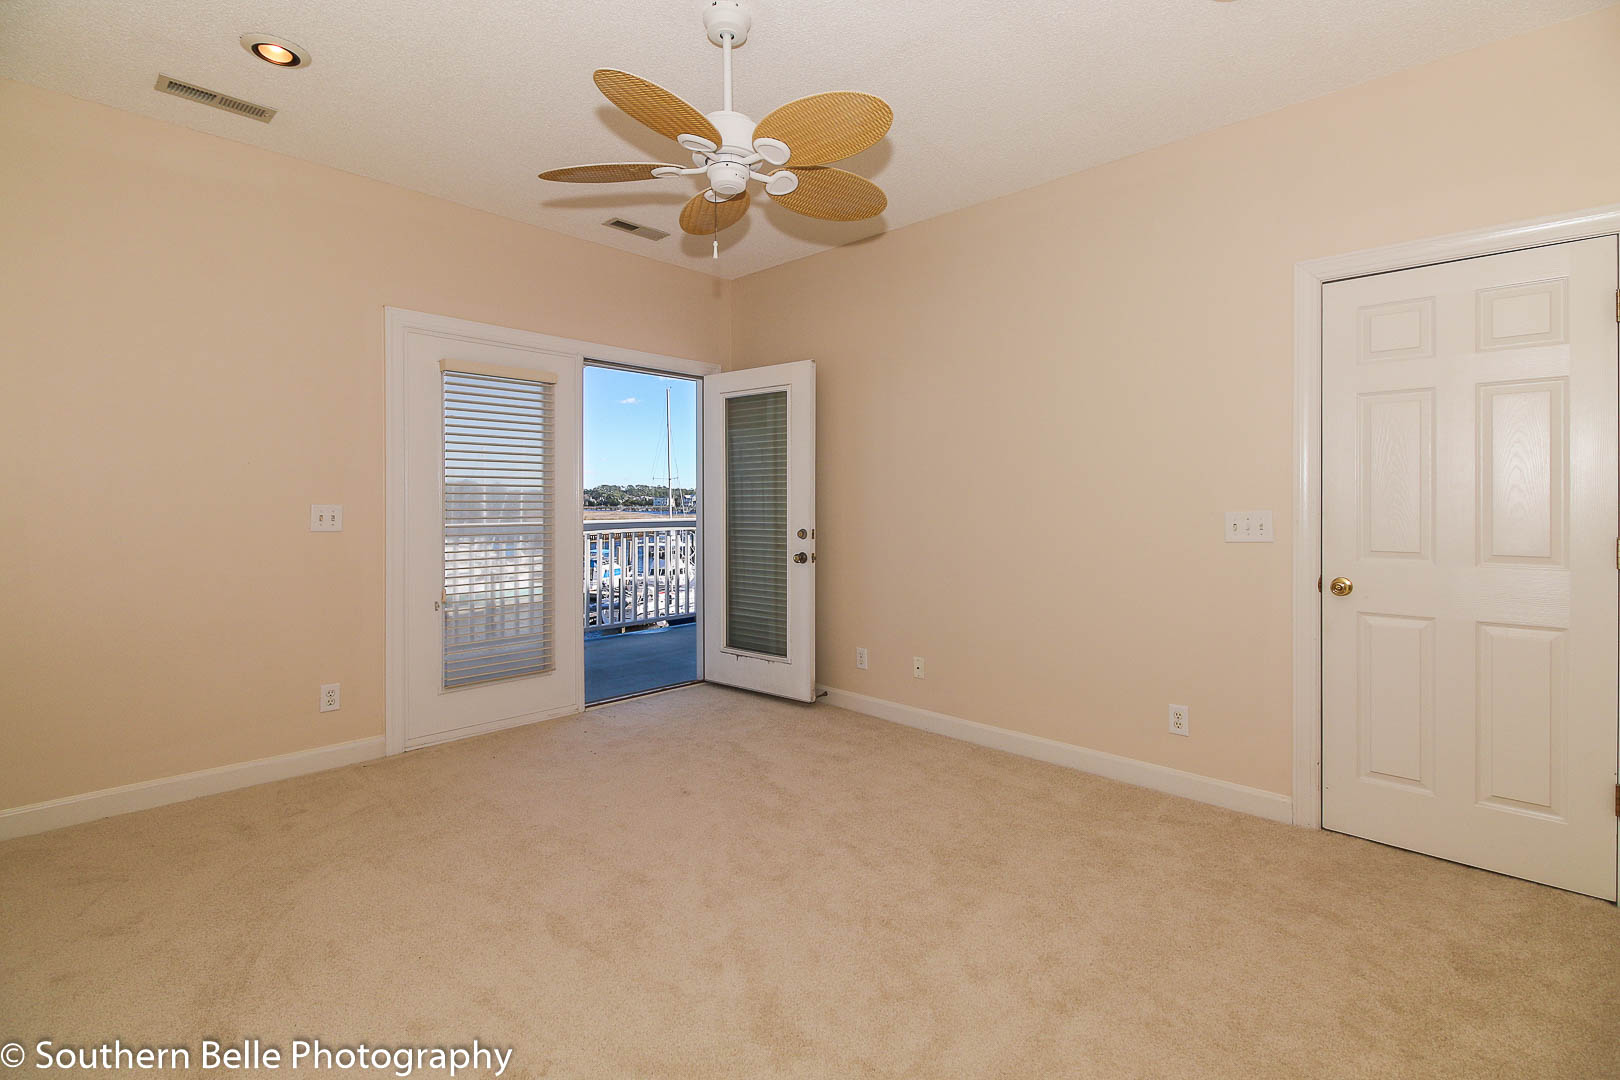 16. Master Bedroom with Balcony View of Intercoastal WM